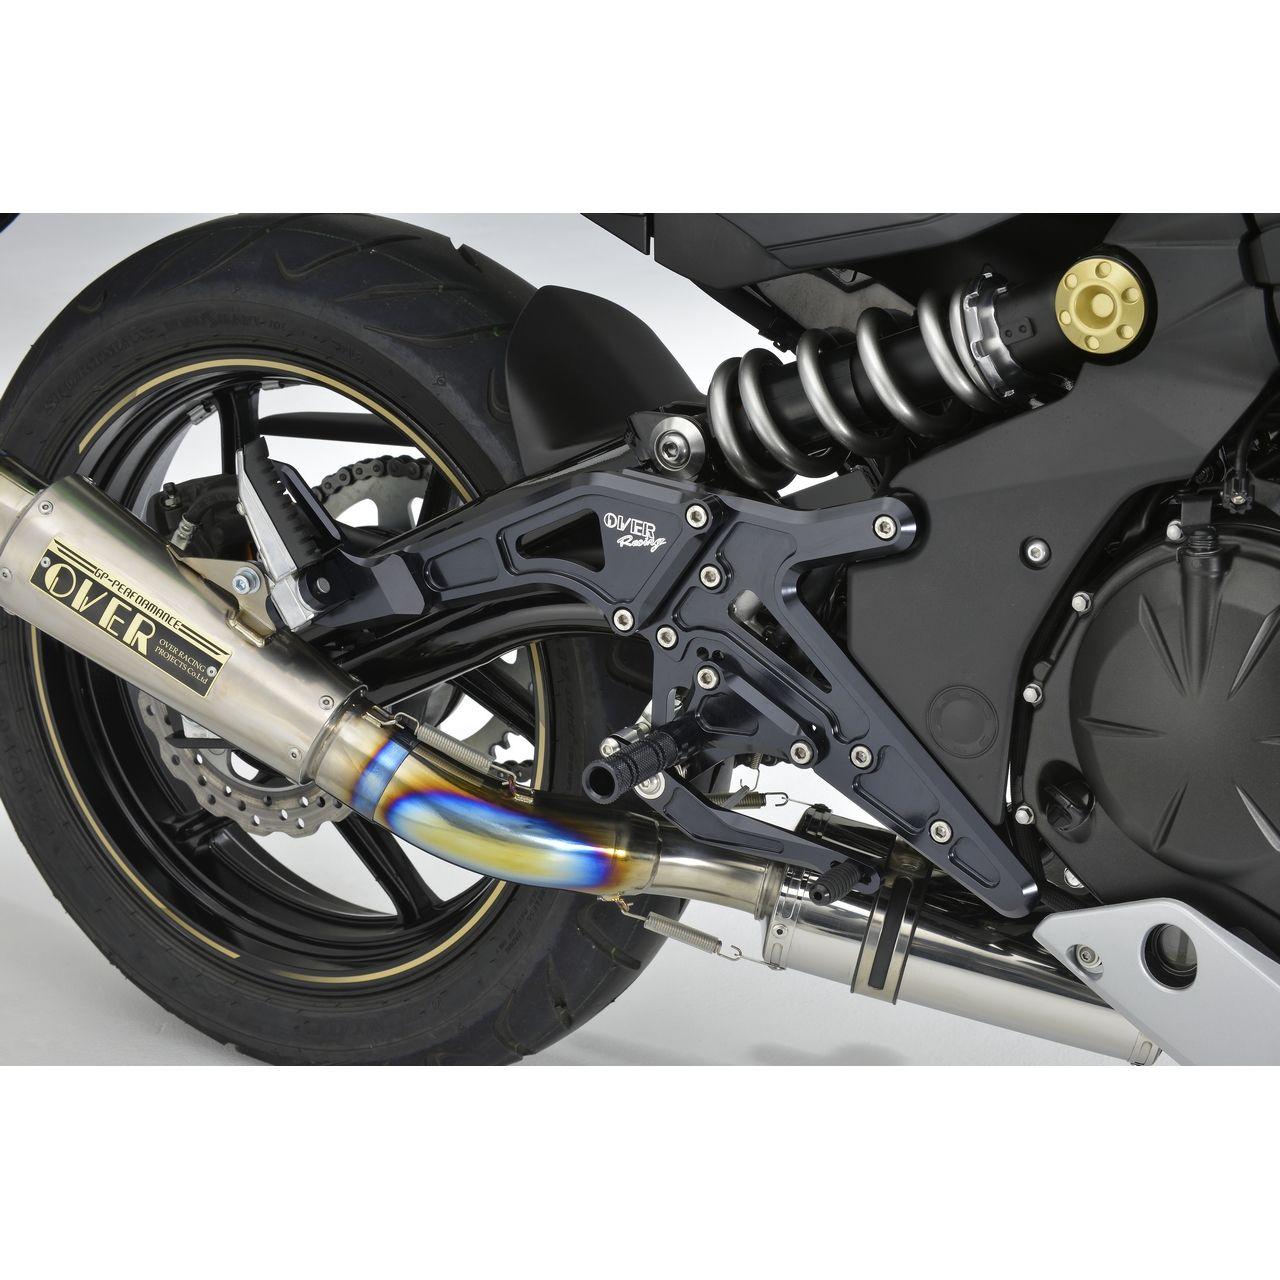 【OVER】4段調整型踏後移套件 - 「Webike-摩托百貨」